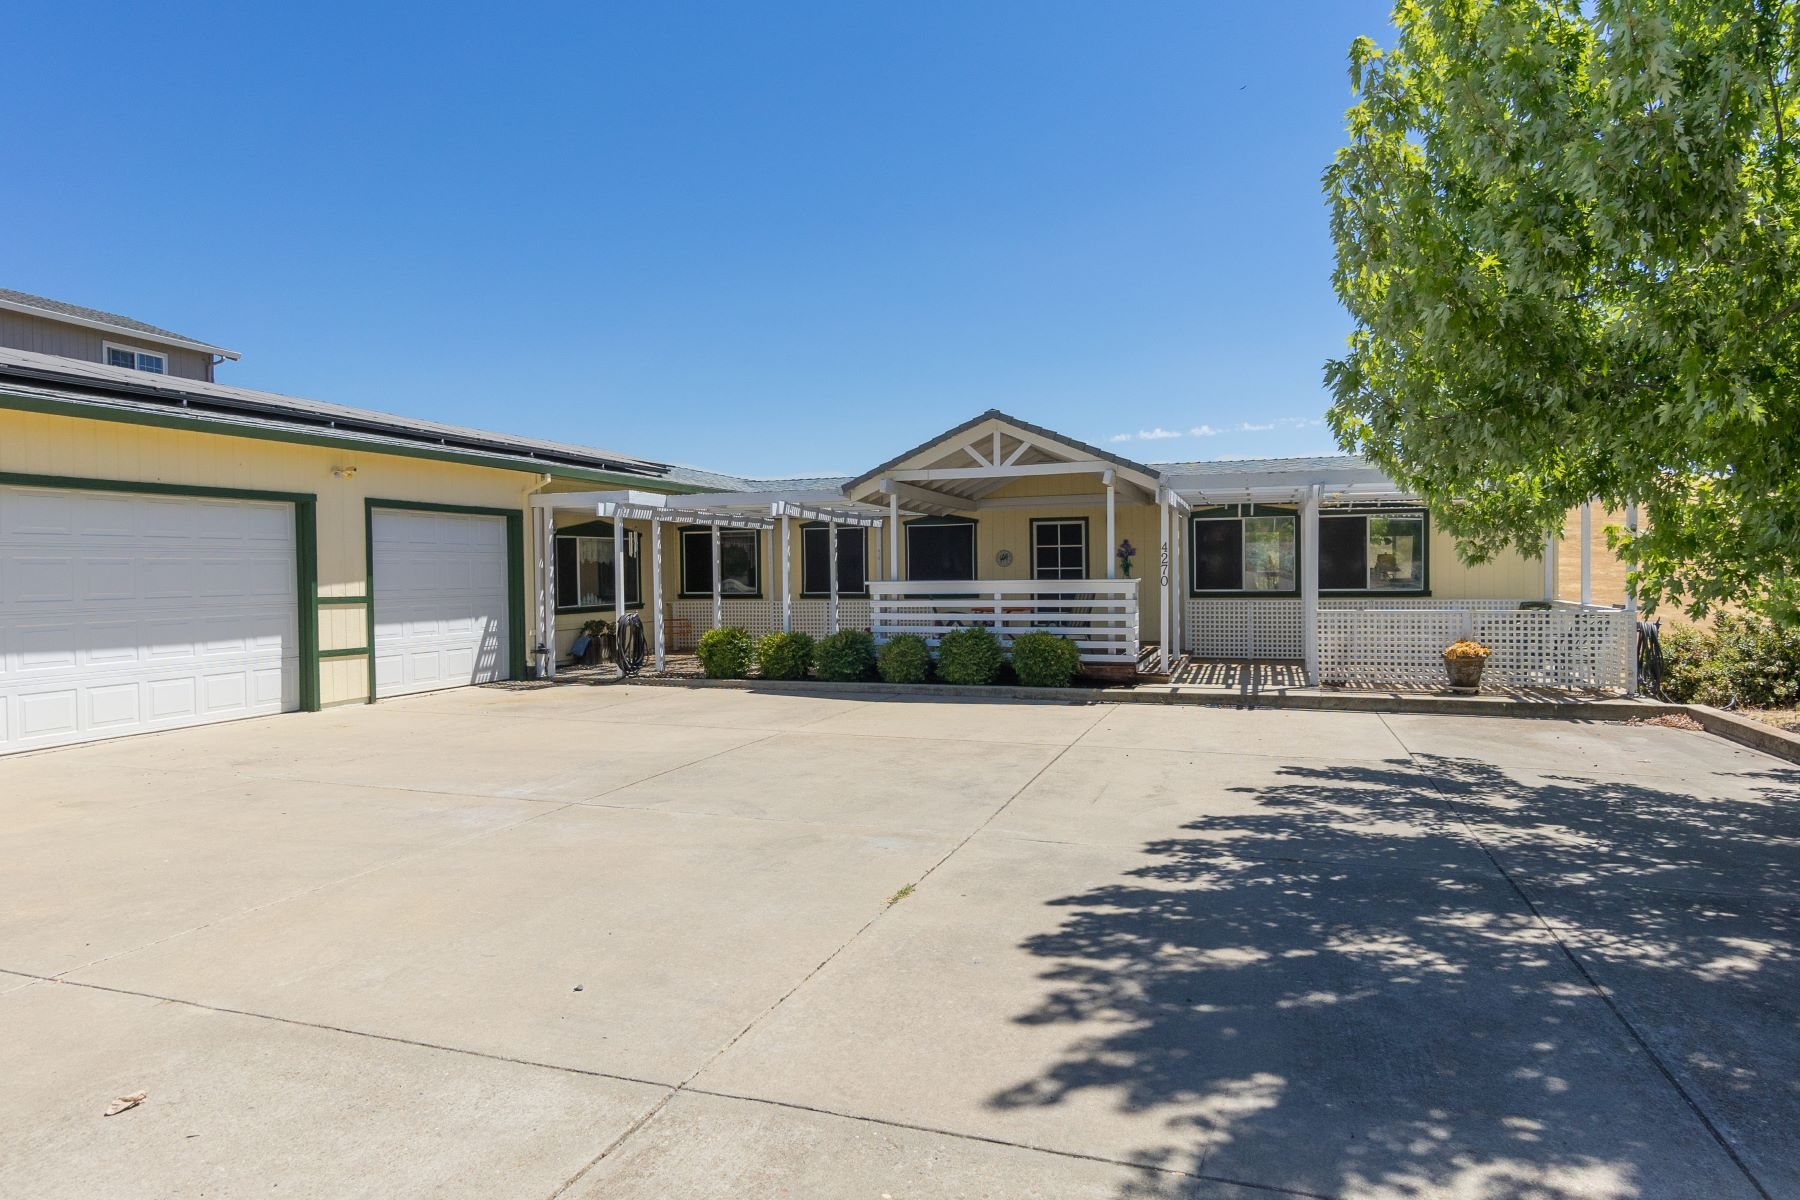 Casa Unifamiliar por un Venta en Charming Home with Beautiful Camanche Lake Views 4270 Lakeview Drive Ione, California 95640 Estados Unidos